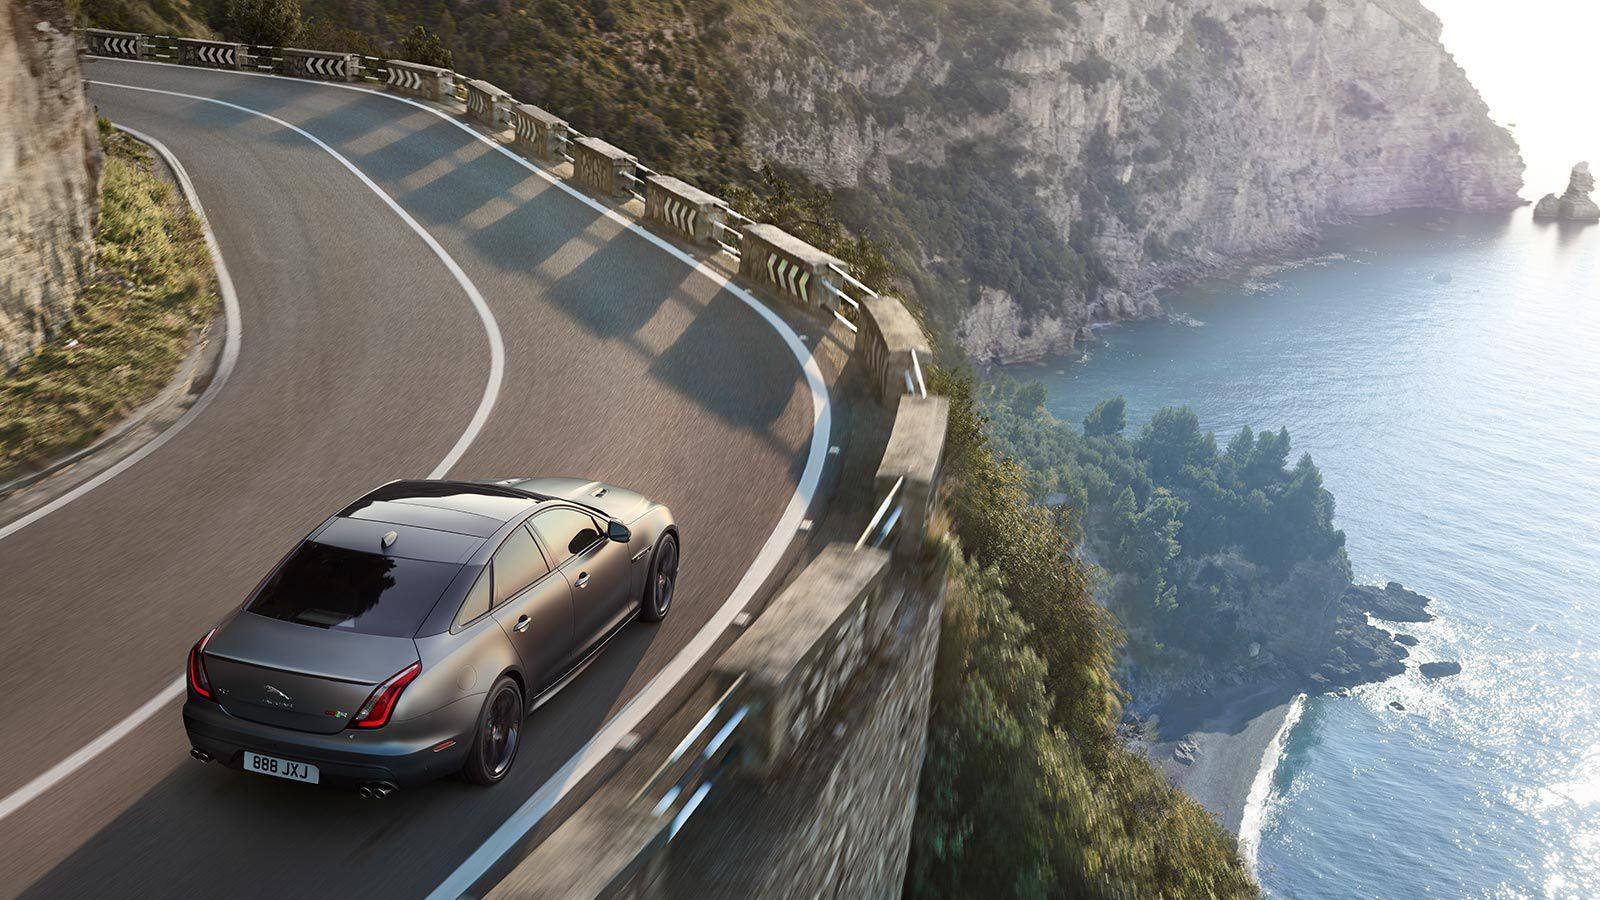 Jaguar XJ Gallery   Jaguar XJ Saloon Car   Jaguar New Zealand